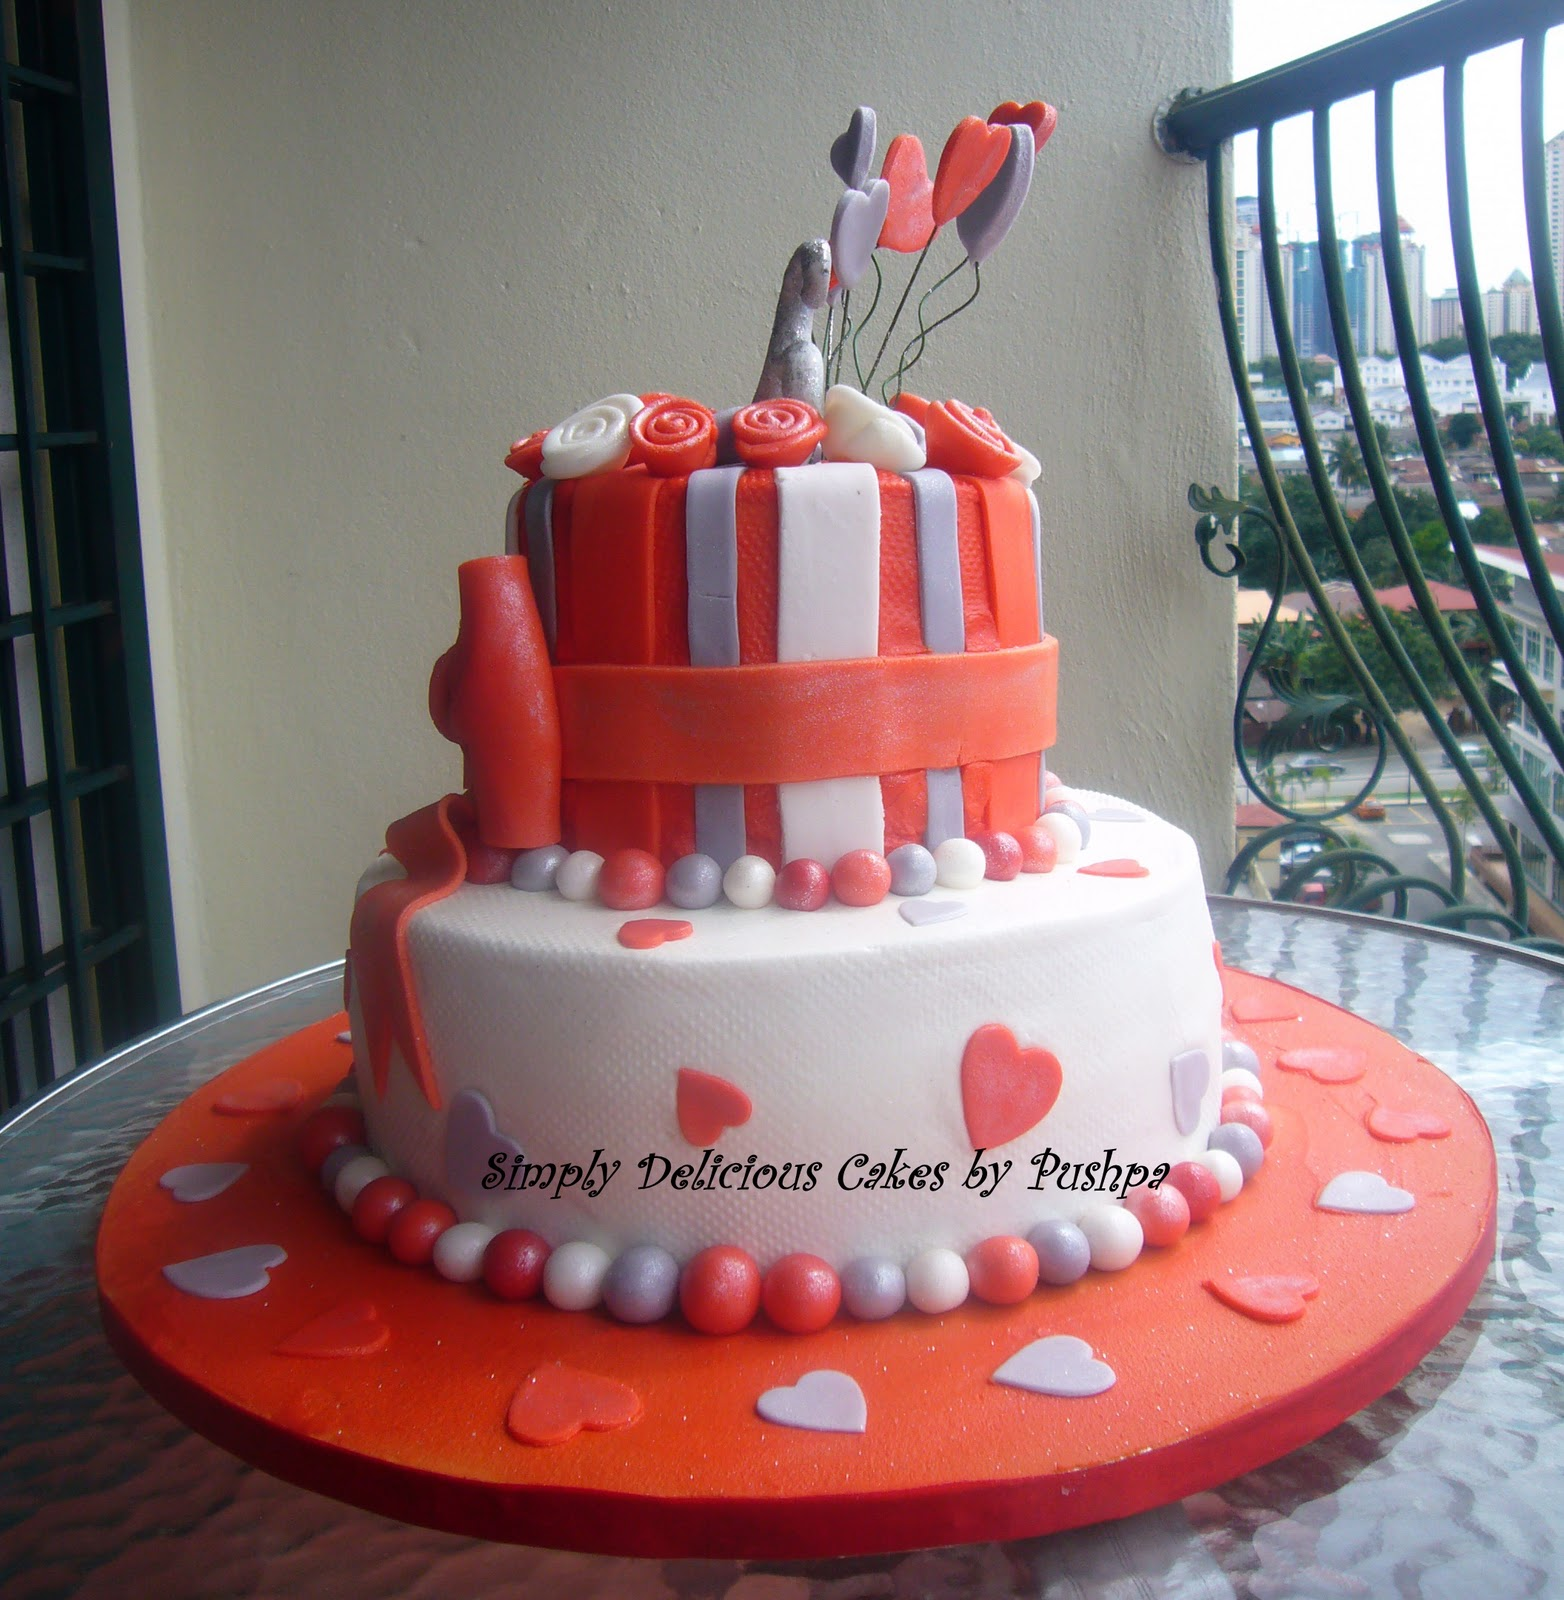 Silver Jubilee Wedding Anniversary Gifts: SIMPLY DELICIOUS CAKES: Silver Jubilee Anniversary